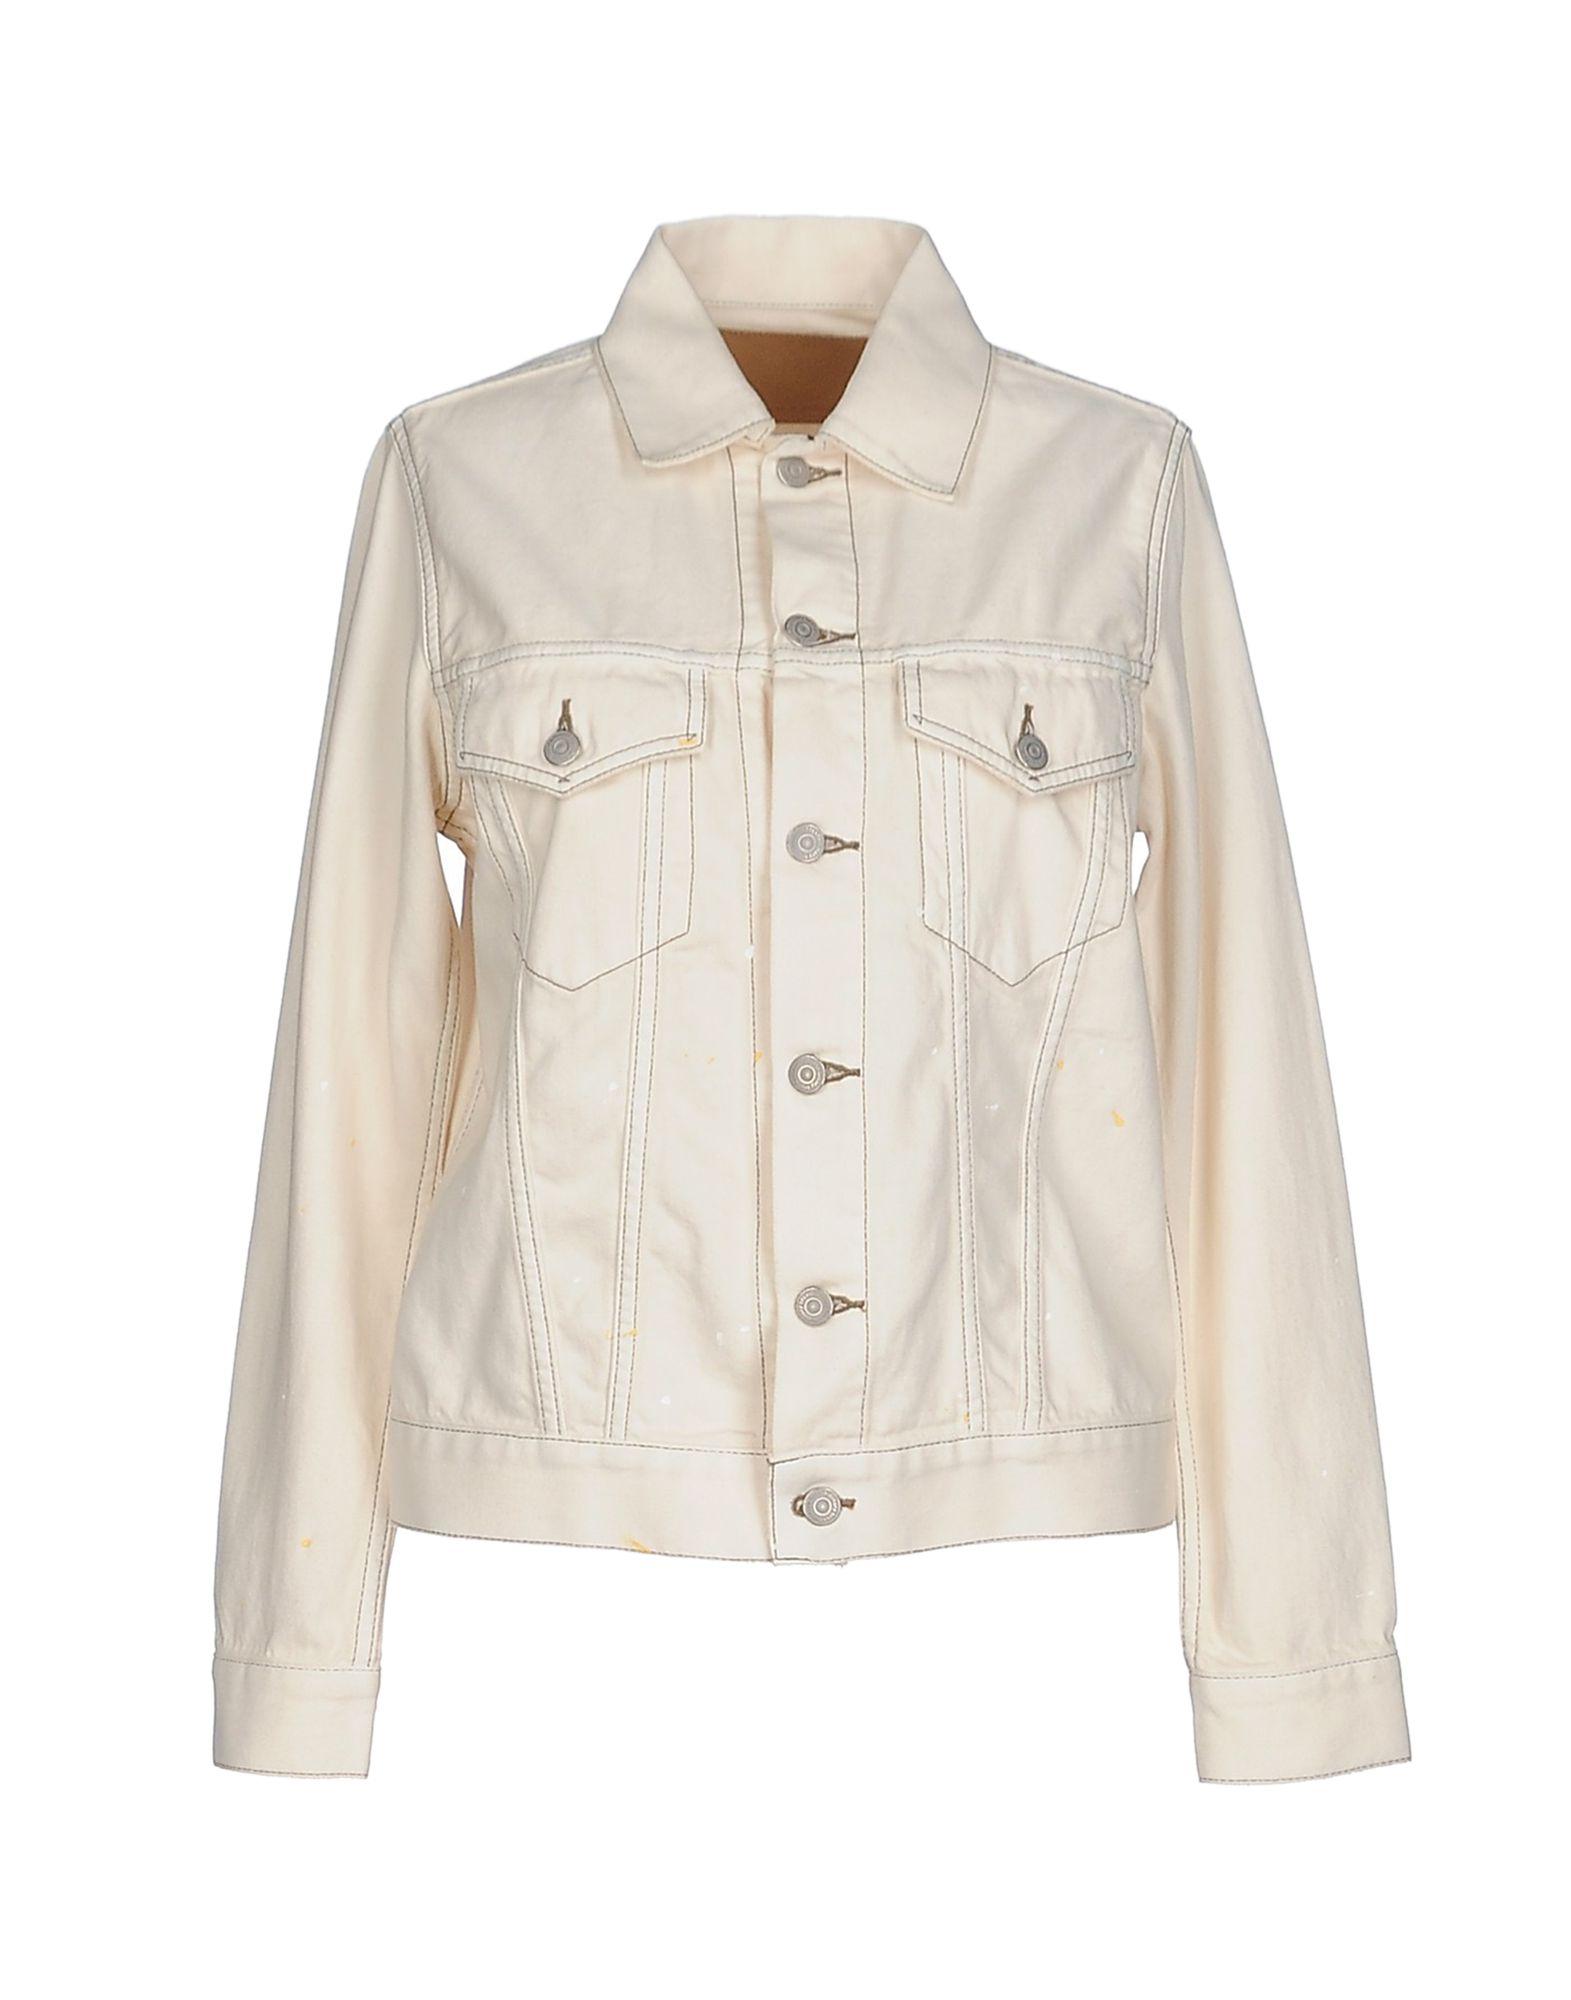 YMC YOU MUST CREATE Джинсовая верхняя одежда тетрадь на скрепке printio you must create